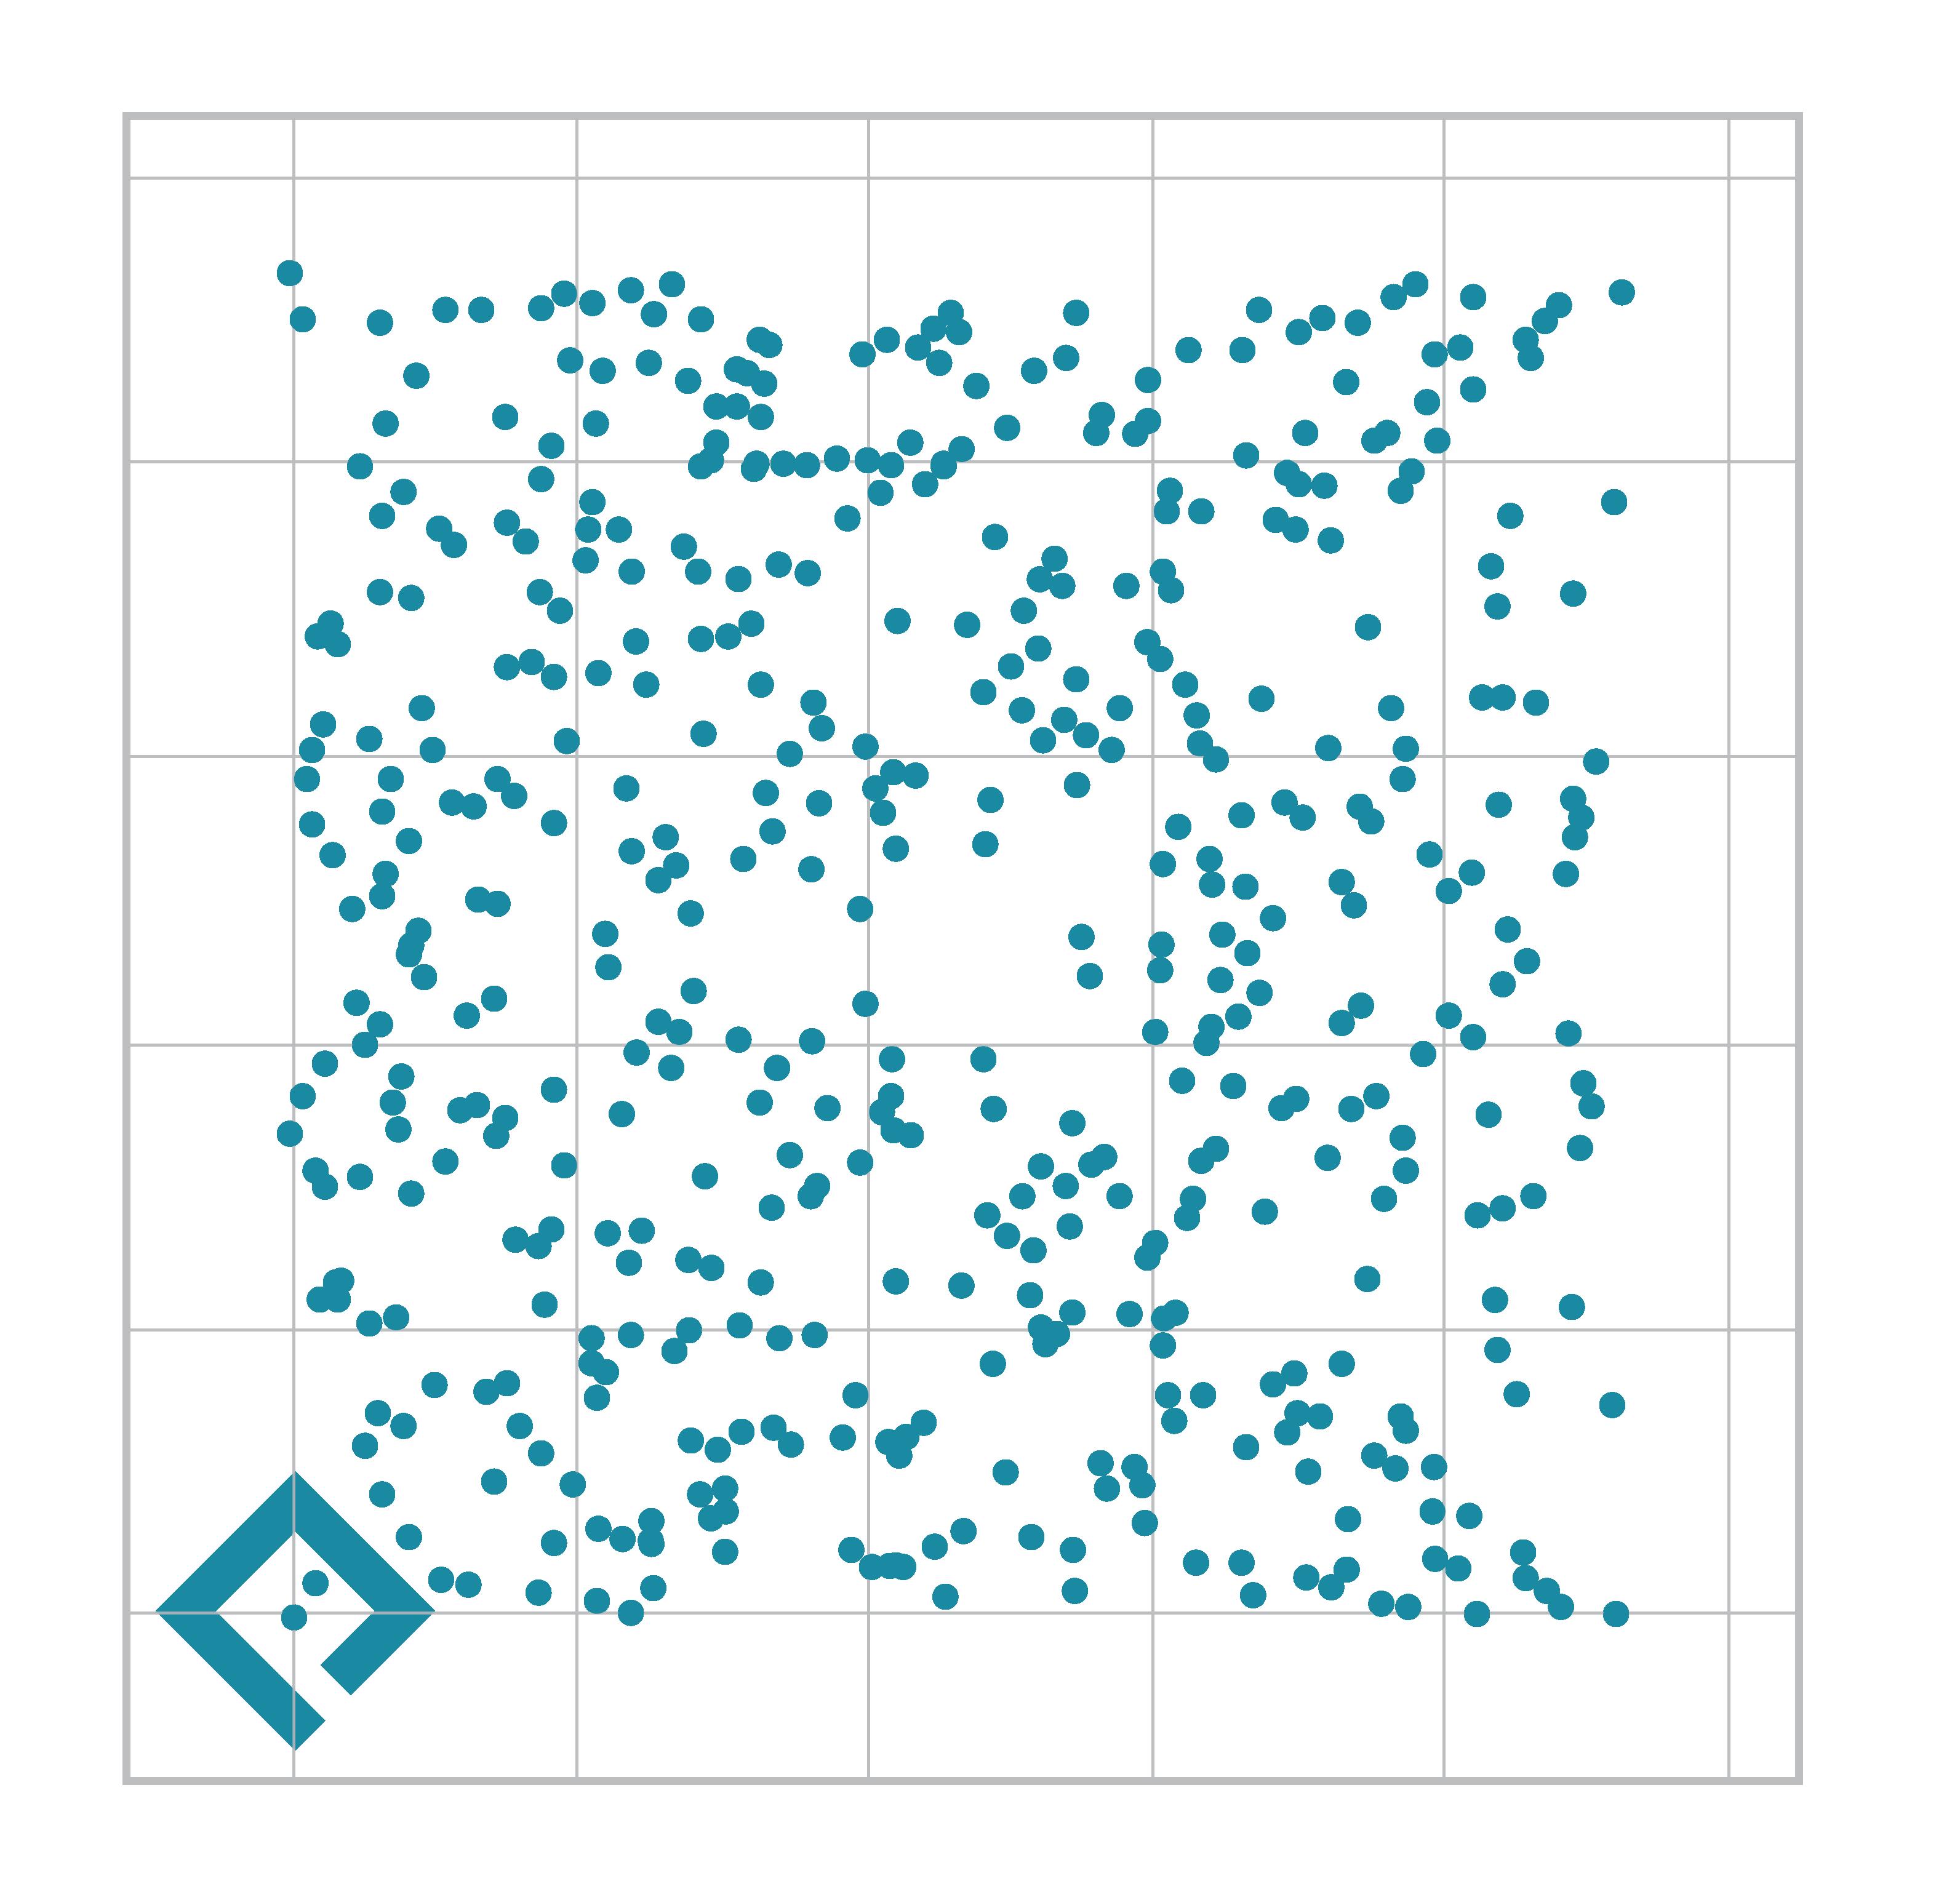 Blockchain101-graphs-10.png